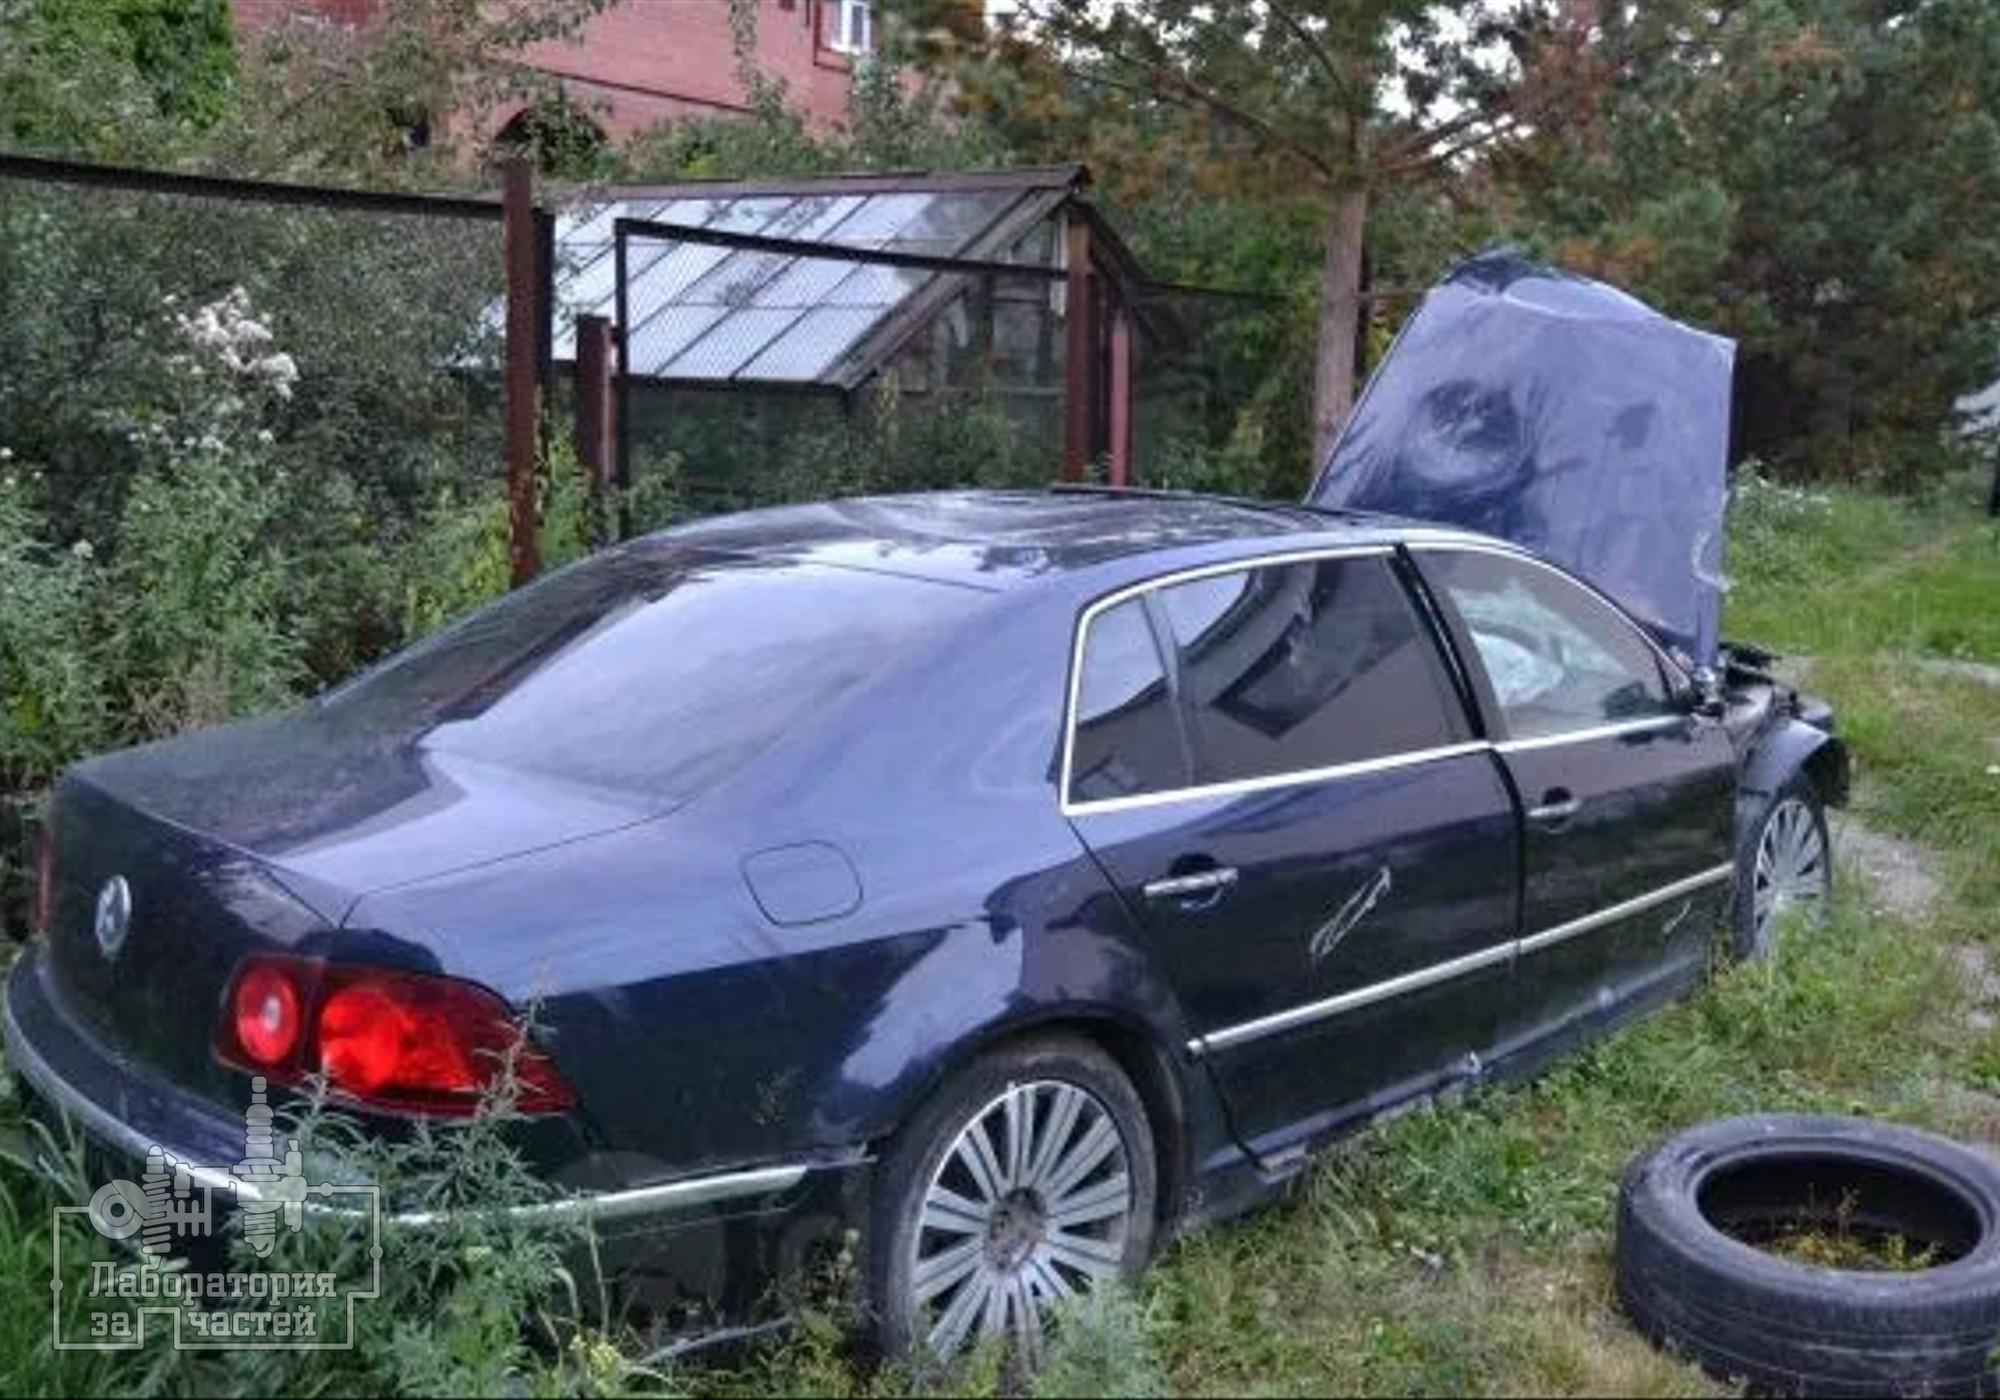 Volkswagen Phaeton 2005 г. в разборе